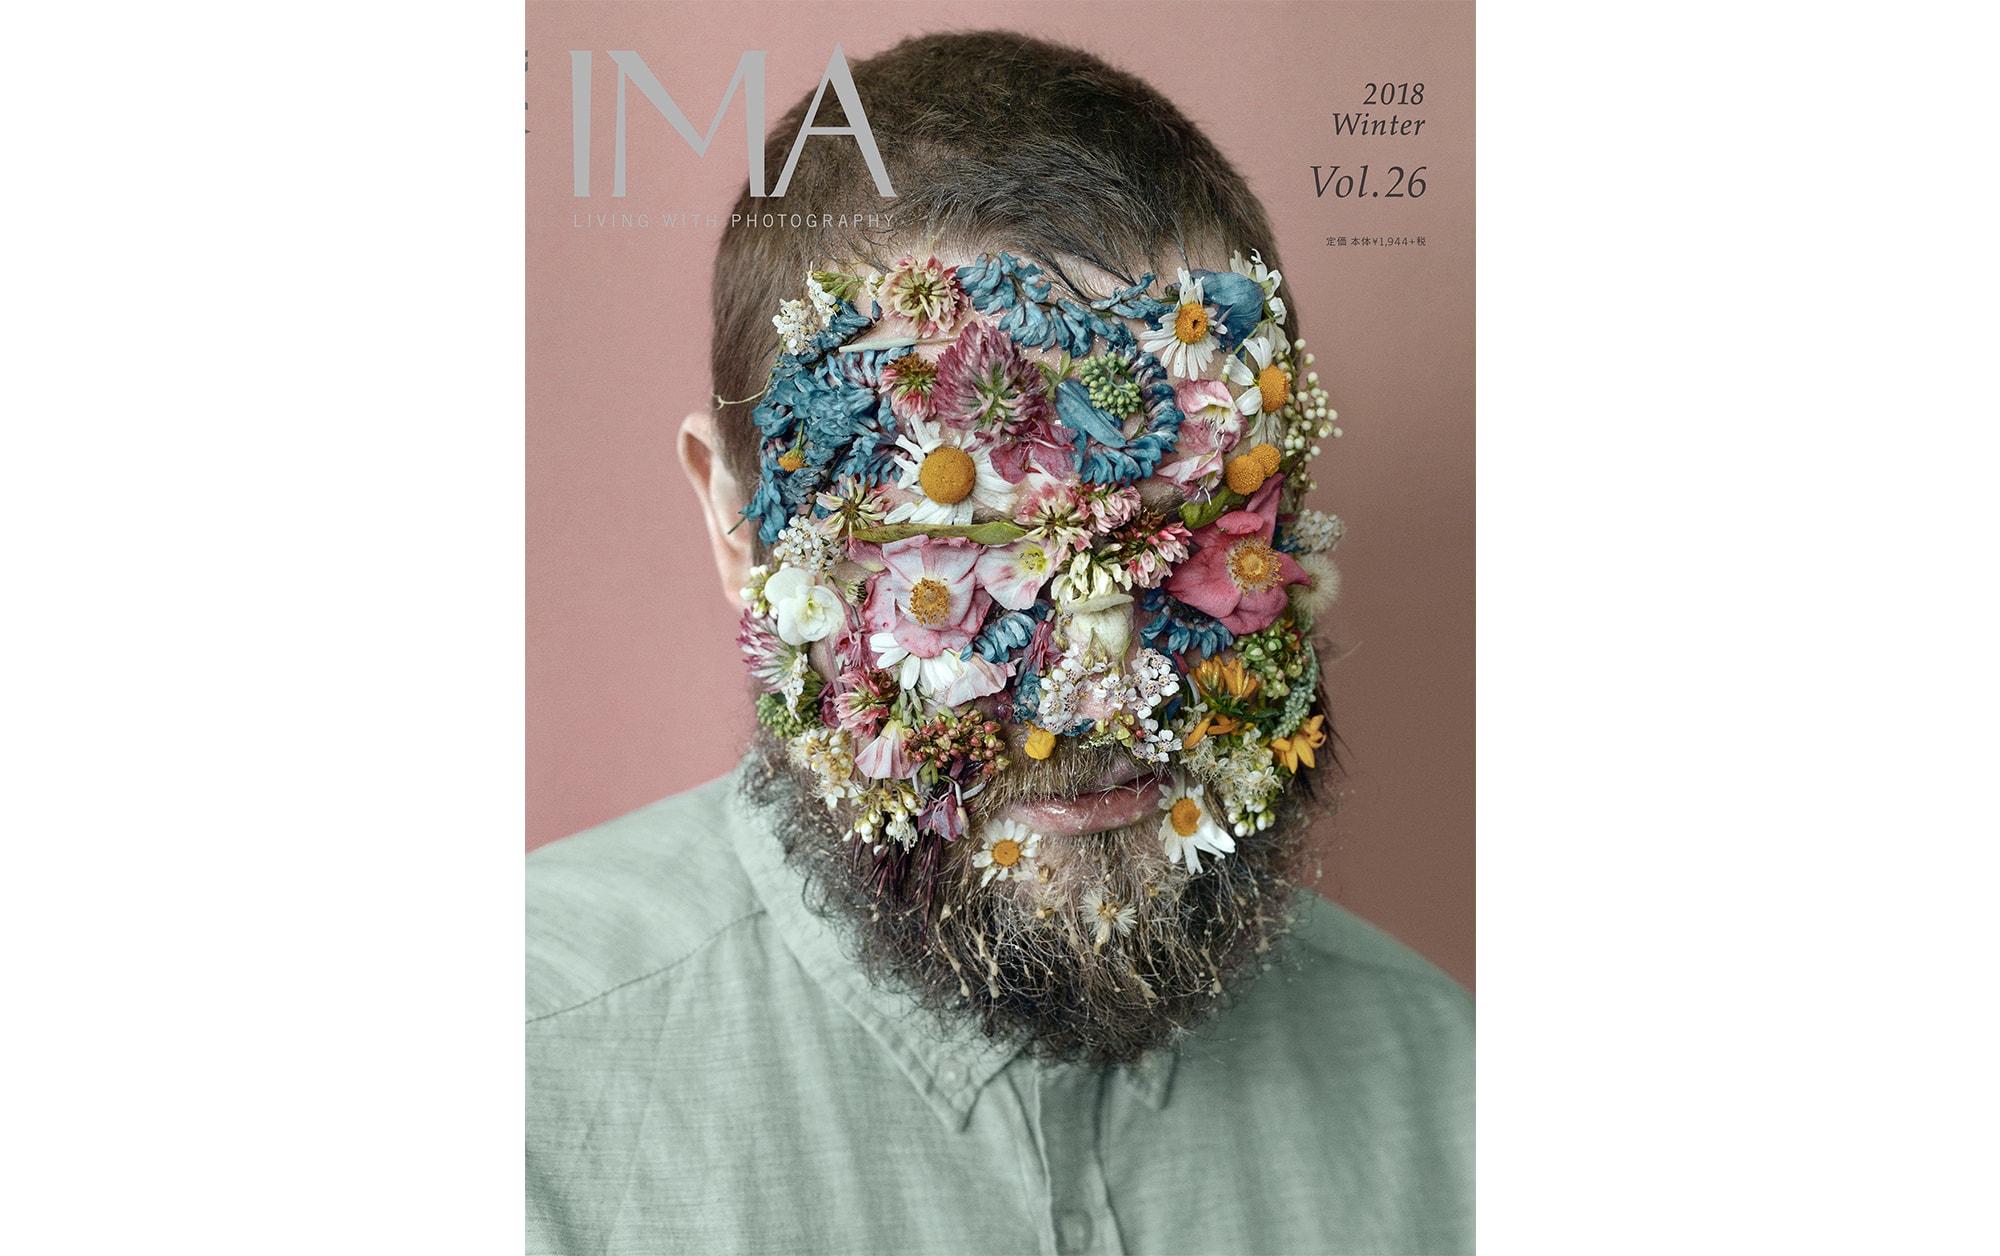 IMA 2018 Winter Vol.26 © Sanna Lehto